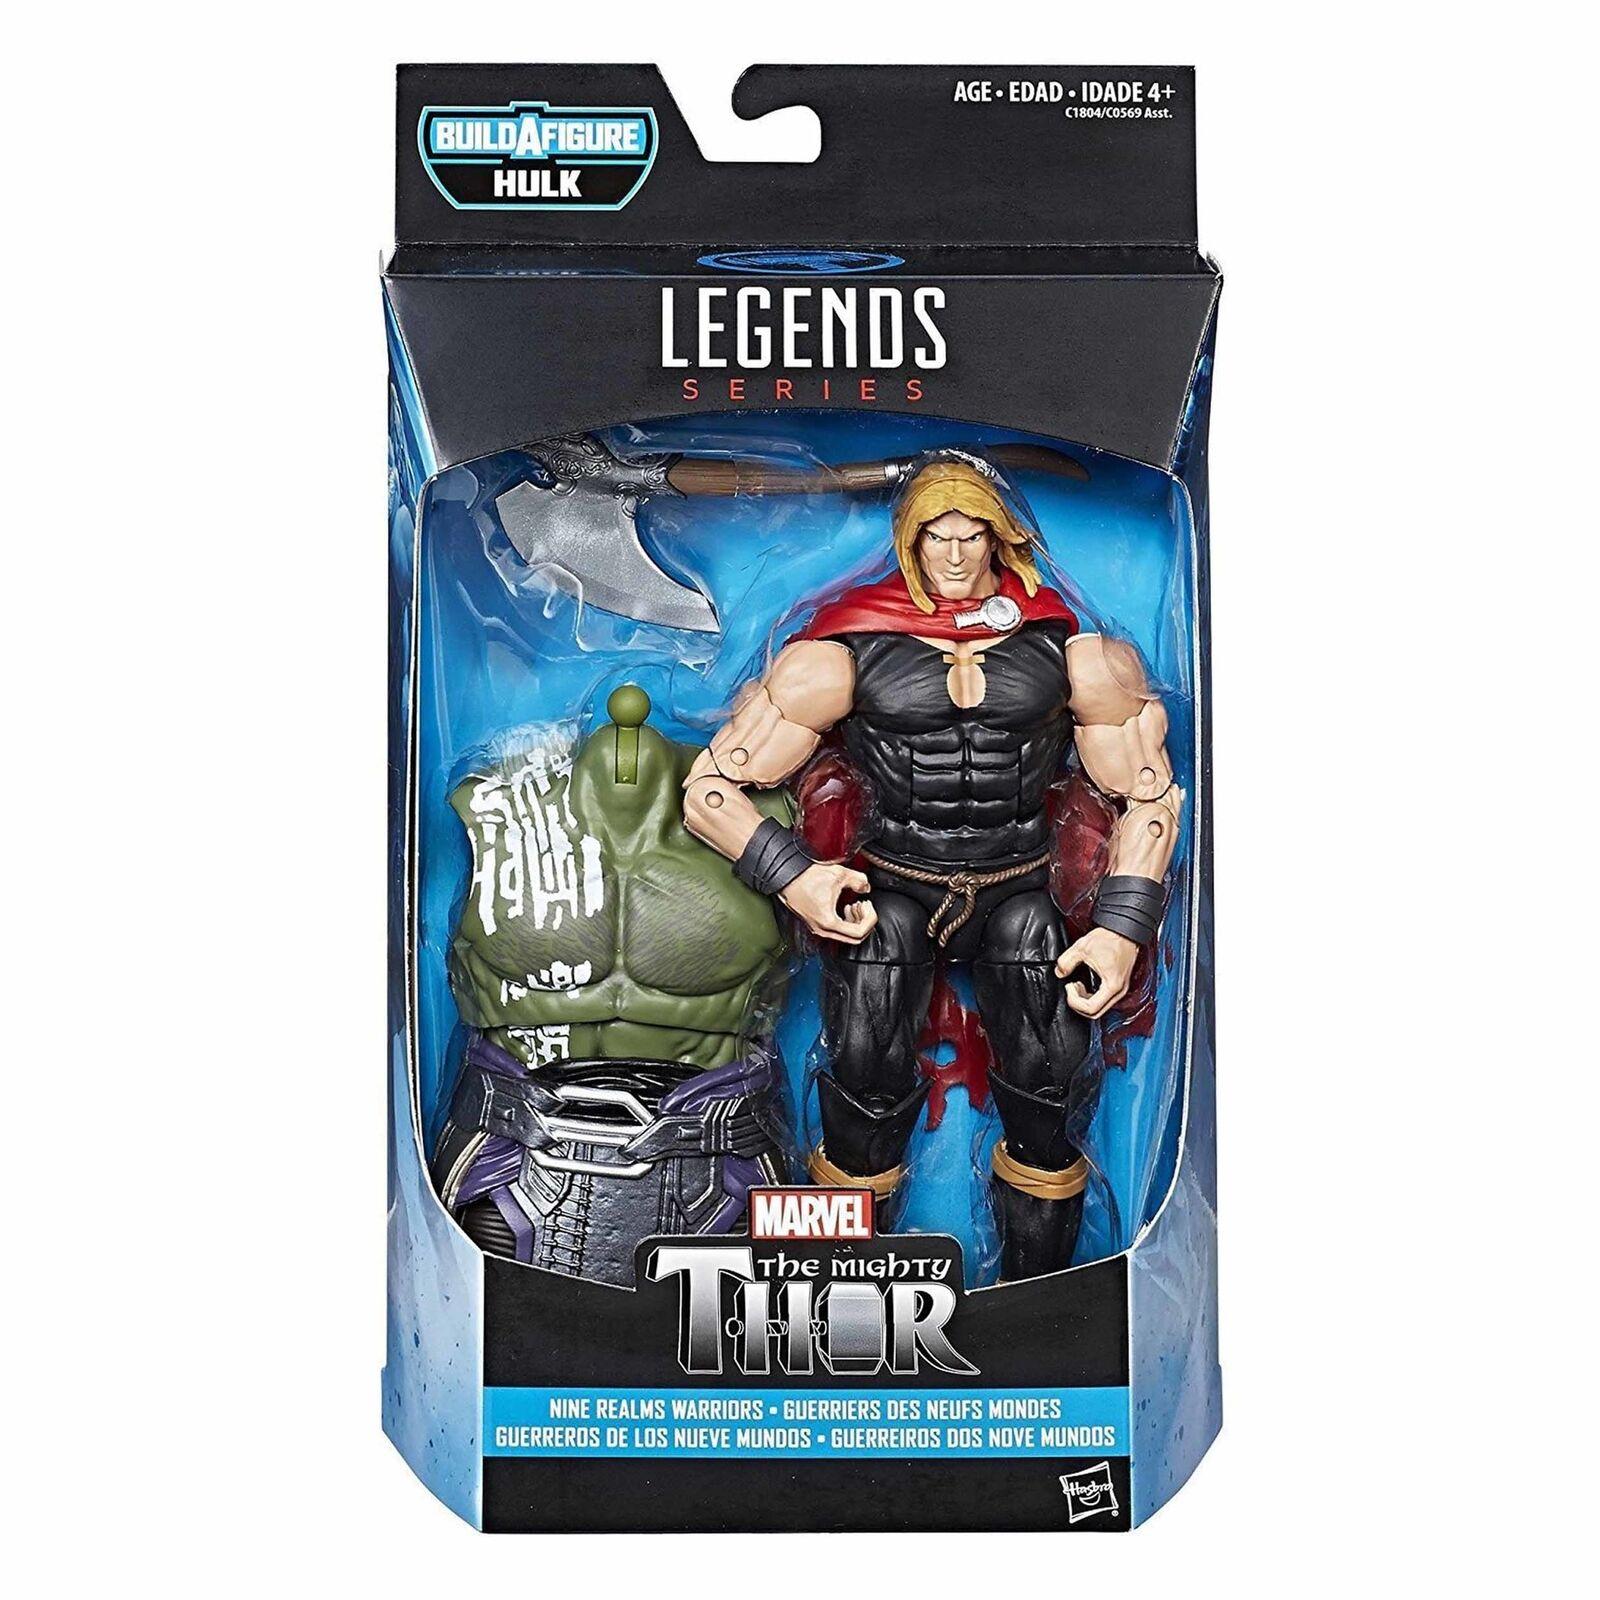 Marvel Legends BAF Series (Hulk) Odinson (Mighty Thor) 6  Figure FREE DELIVERY